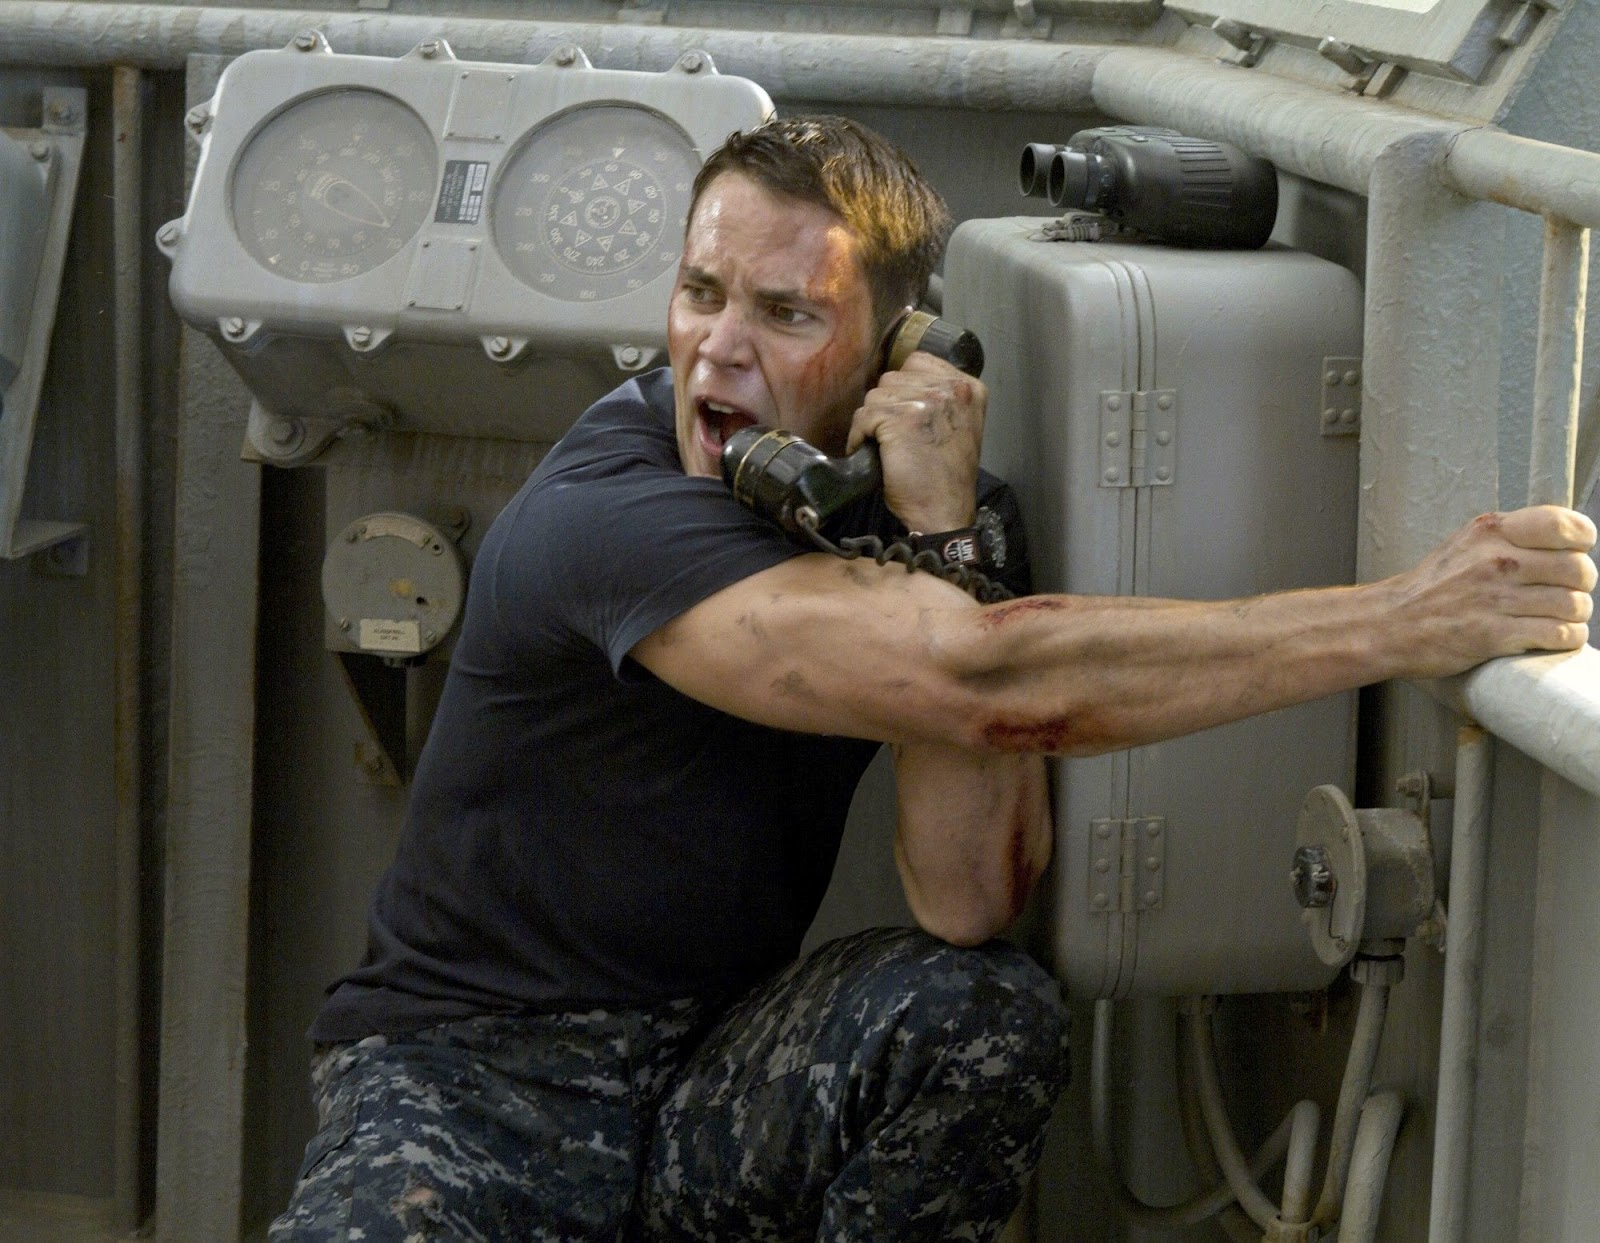 http://4.bp.blogspot.com/-r9YSd-ohlWo/T5M4XAY40KI/AAAAAAAACQU/k6QilvQ7IJ0/s1600/Battleship2.jpg